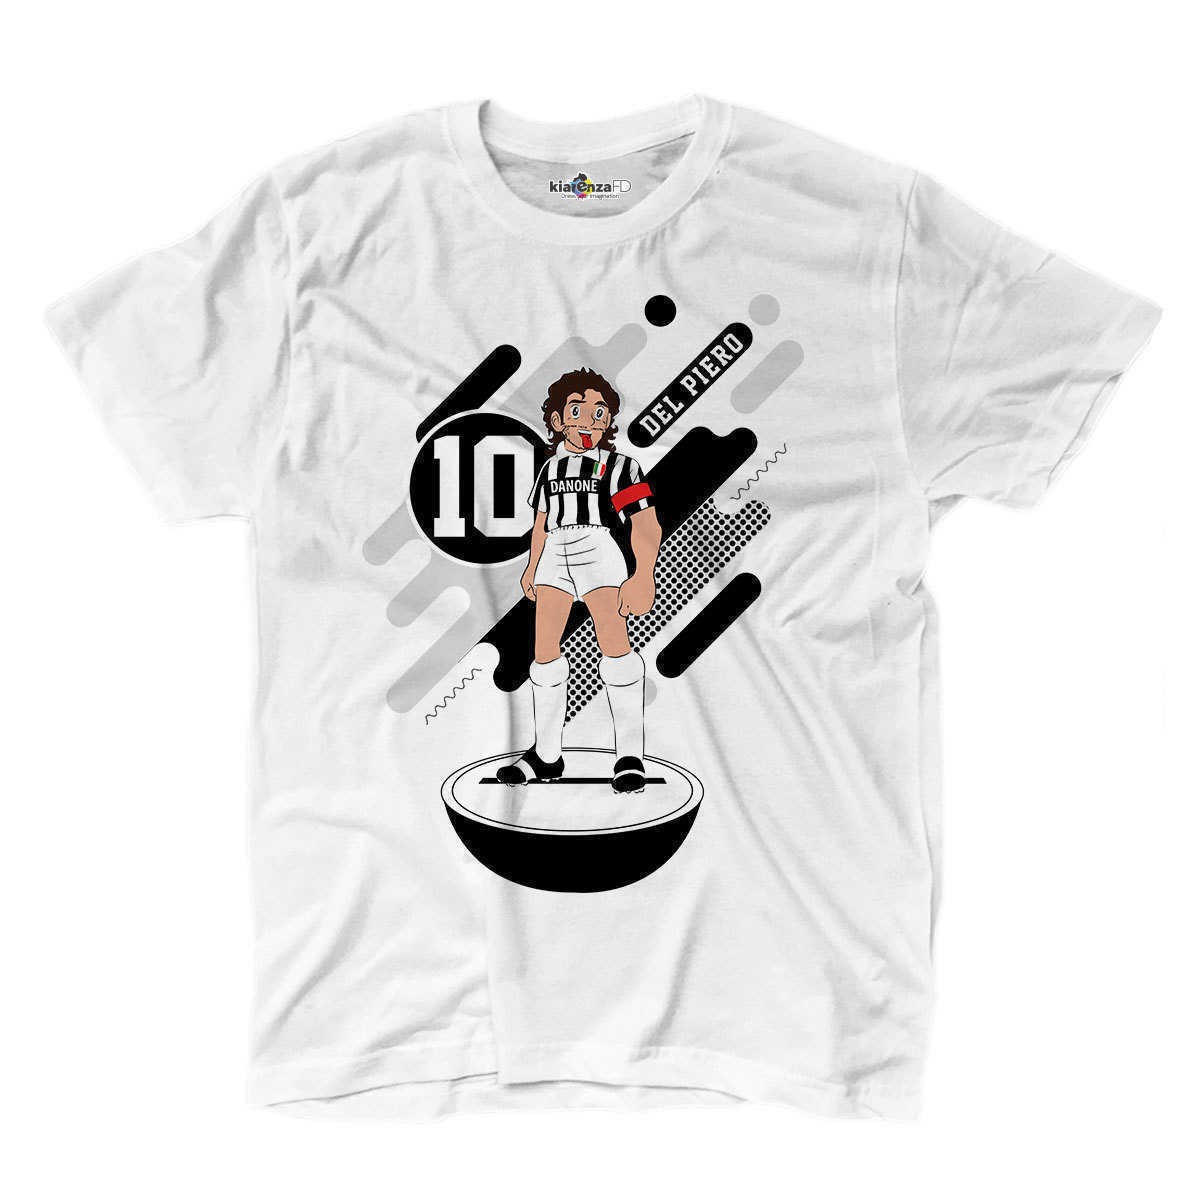 Camisa de futebol t camisa manga del piero lenda branca spoof subbuteo holly e benji s